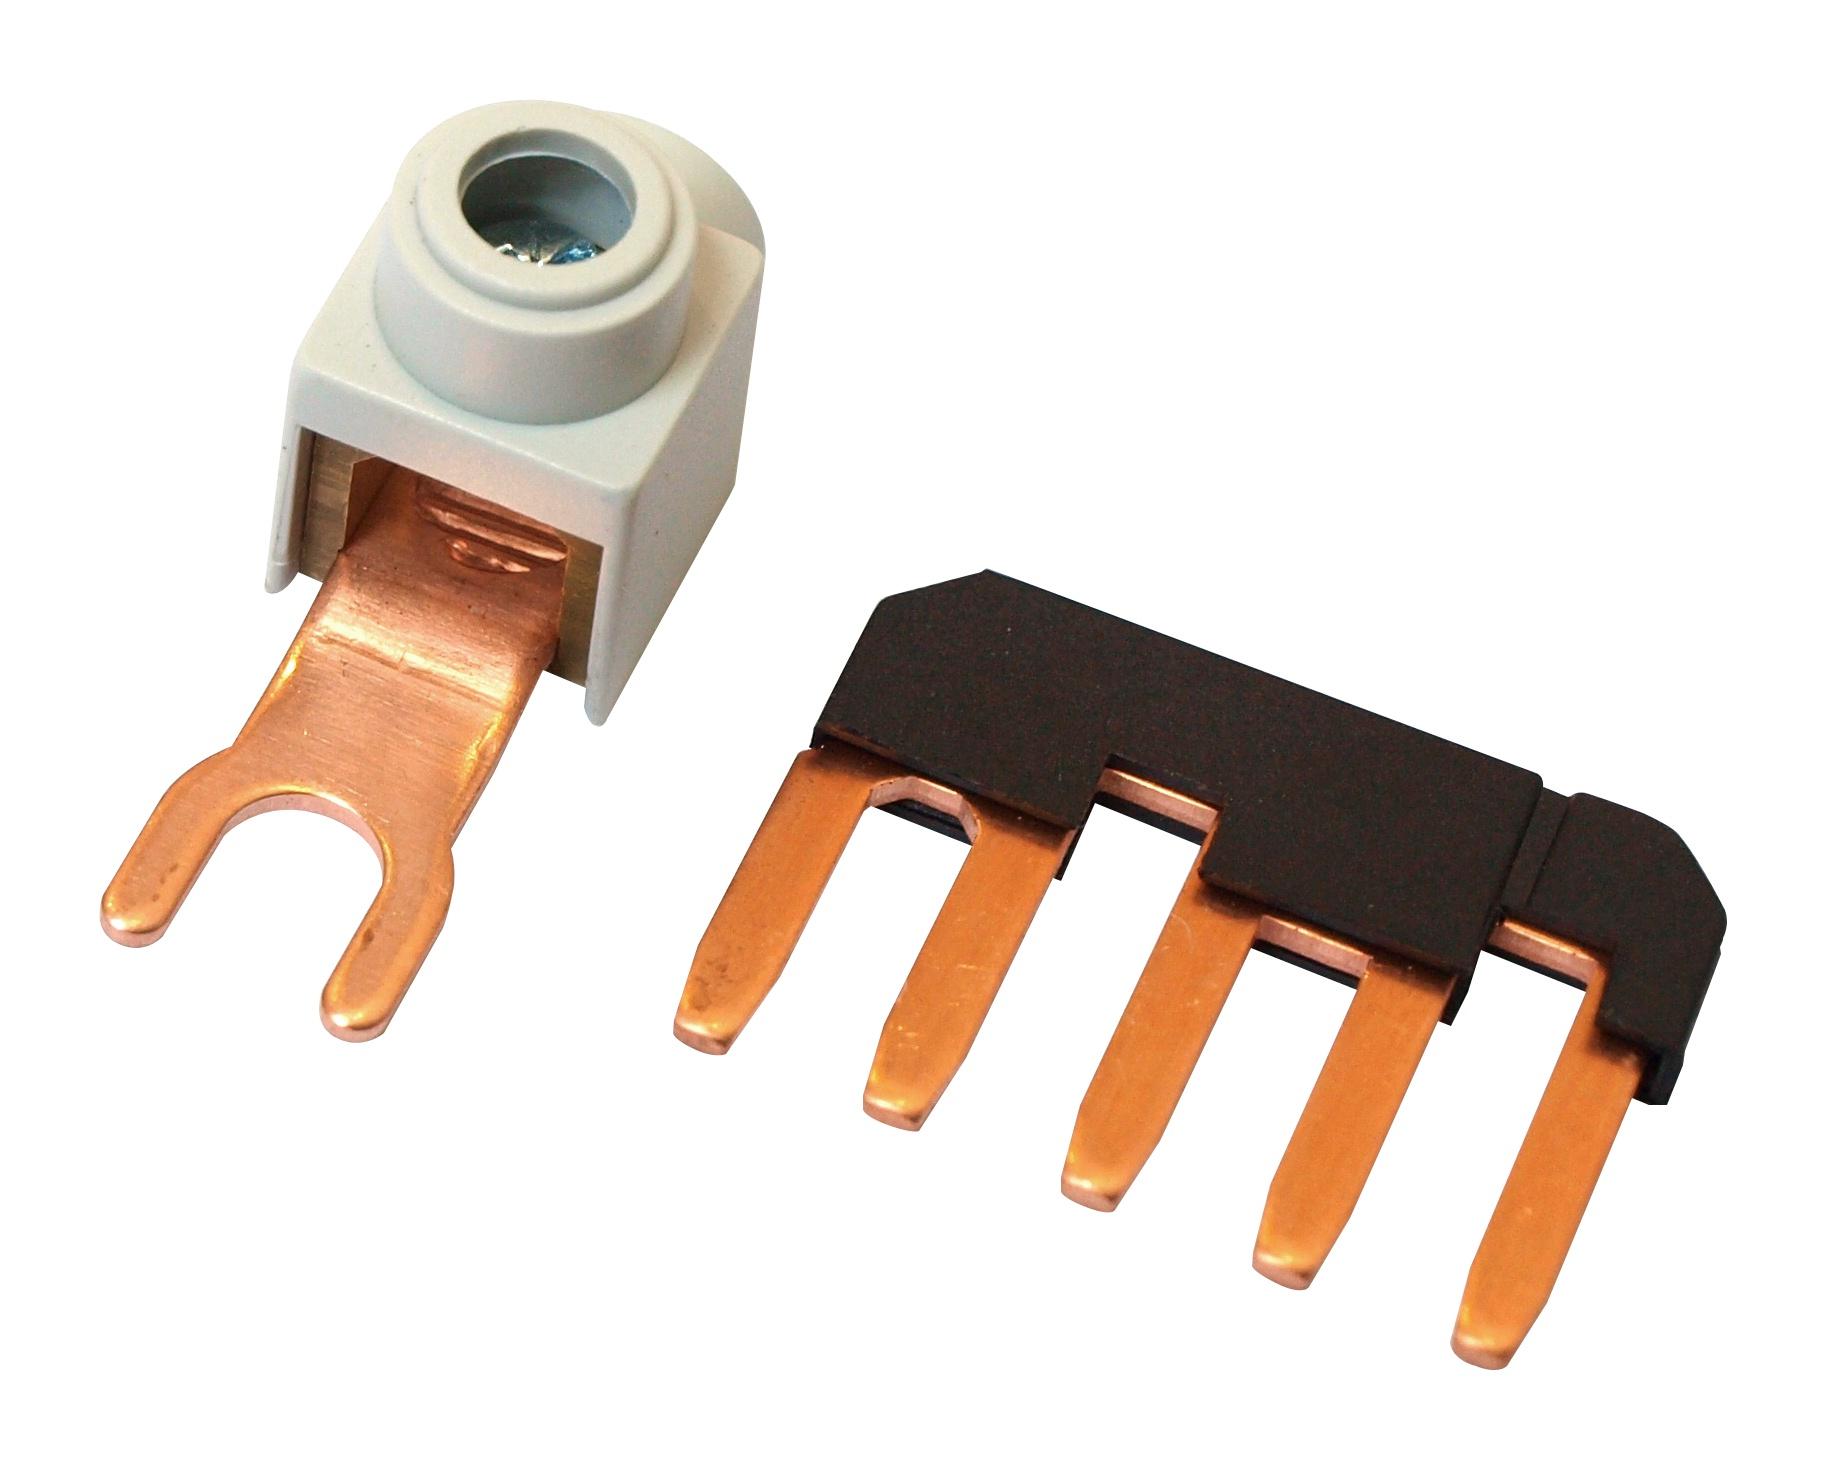 1 Stk Parallelschaltverbinder 3-Polig mit Klemme 35mm² für LSD0 LSZ0D003--